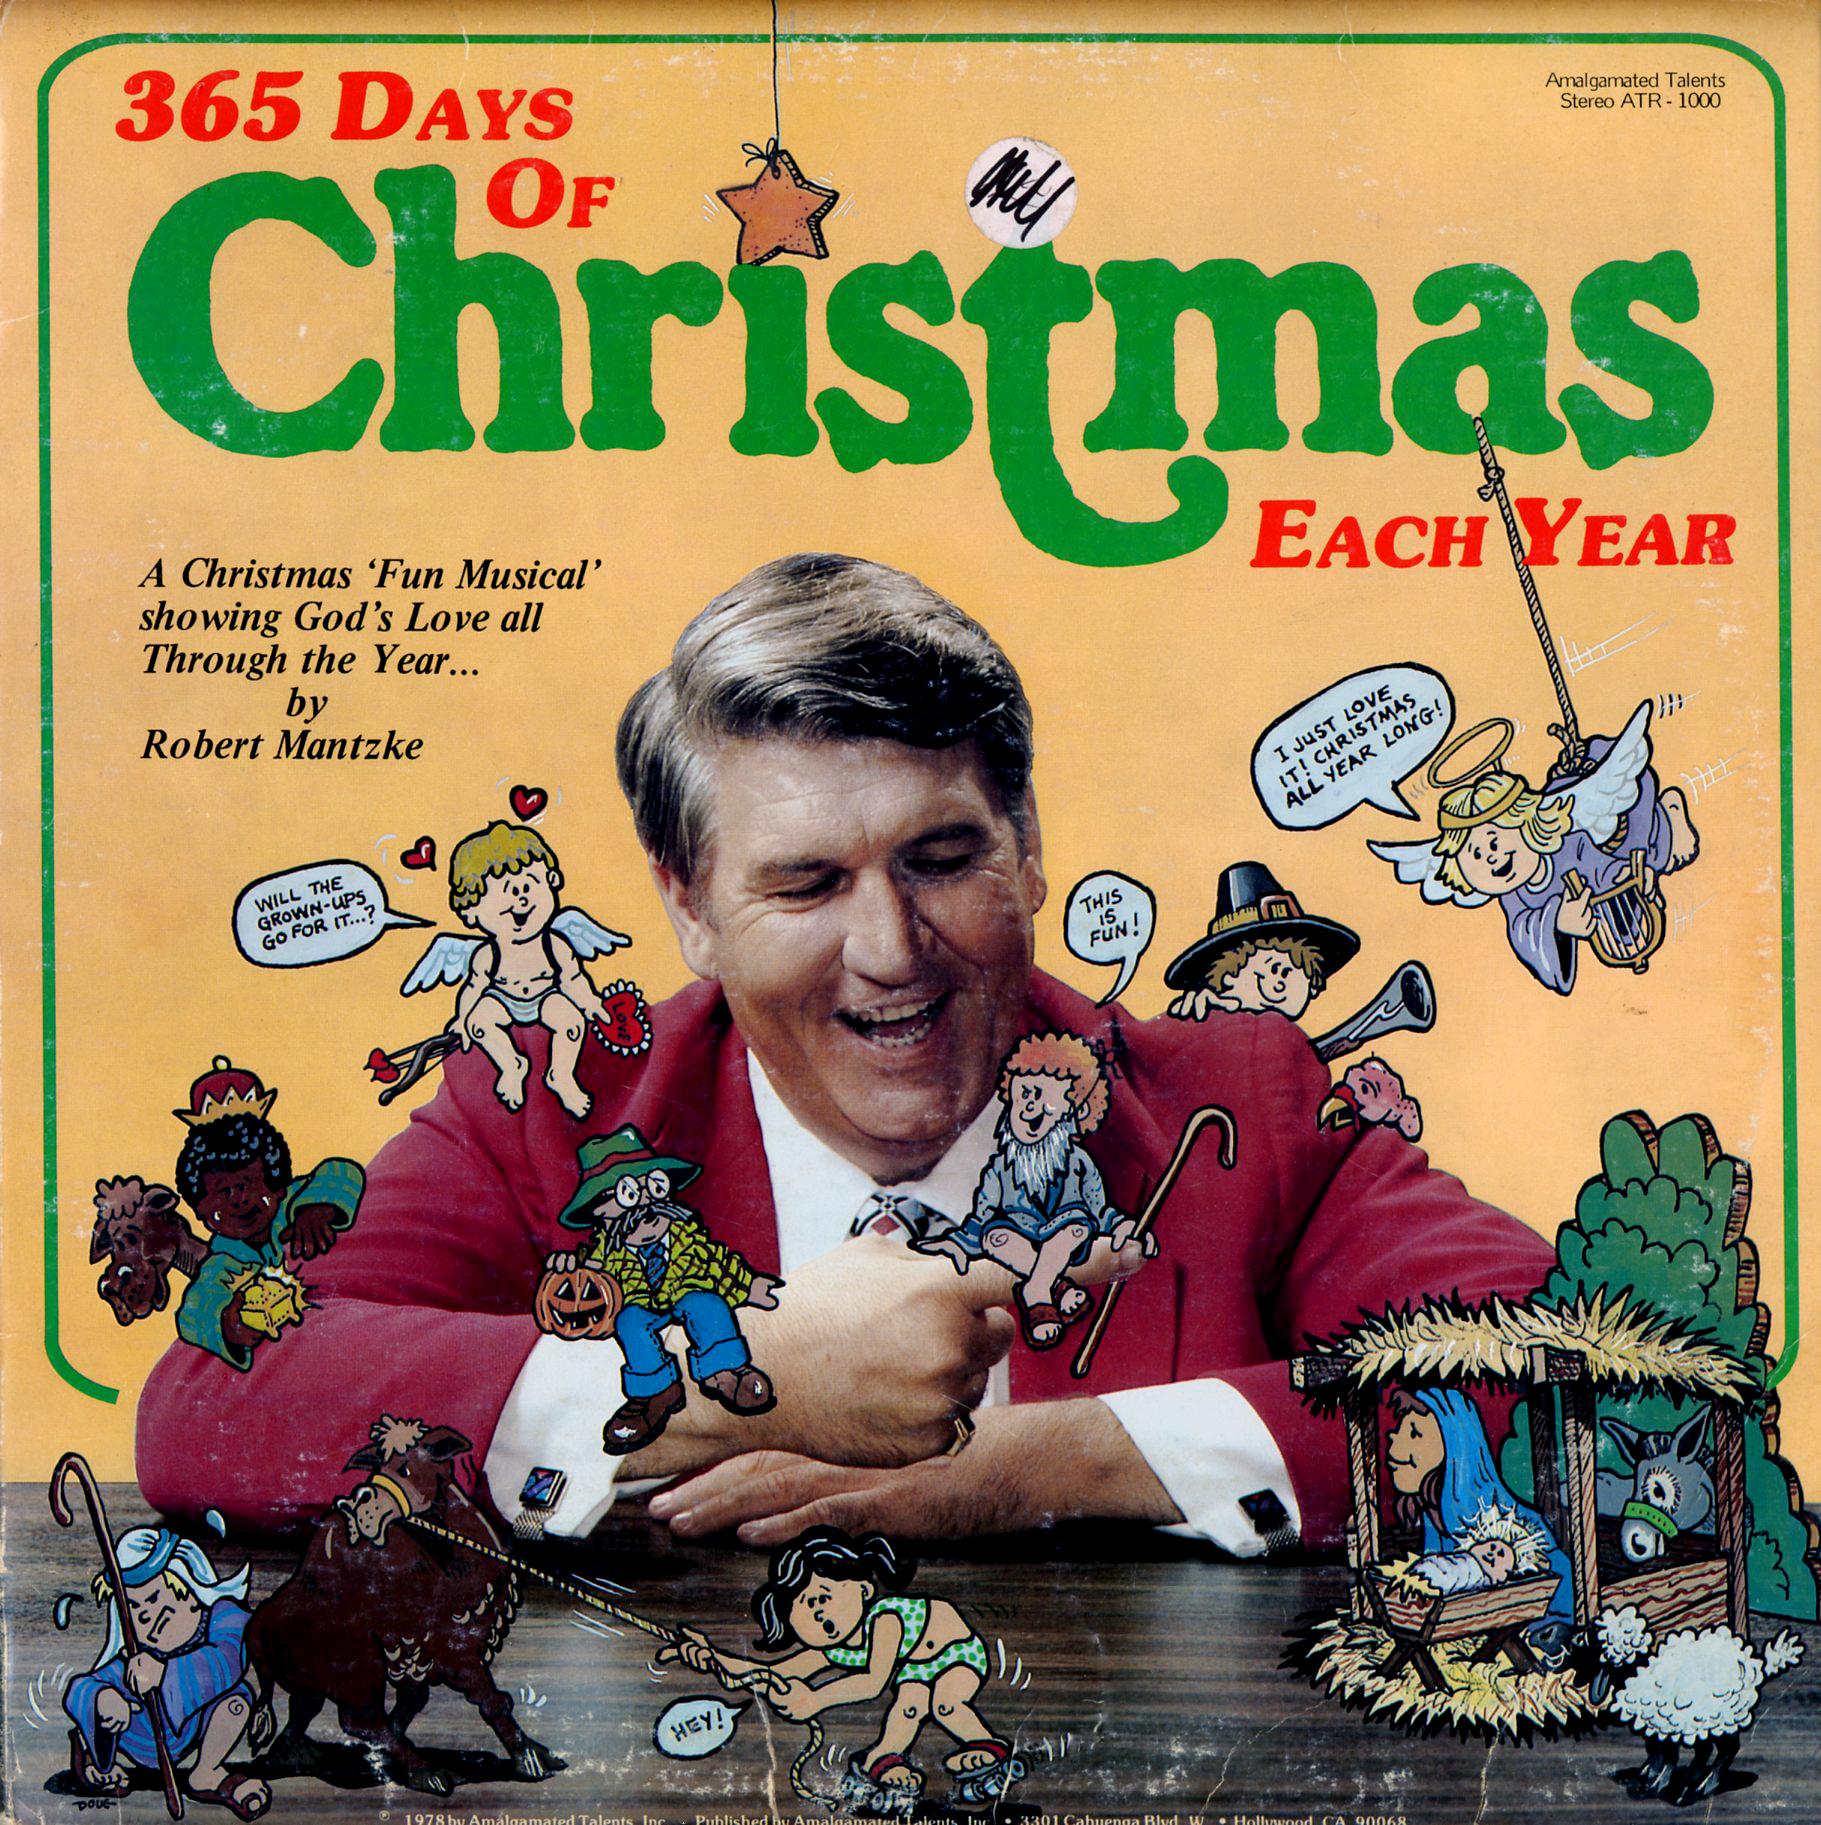 Mantzke, Robert. 365 Days of Christmas Each Year. A Christmas Musical. (ATR1000) - Christmas LPs ...